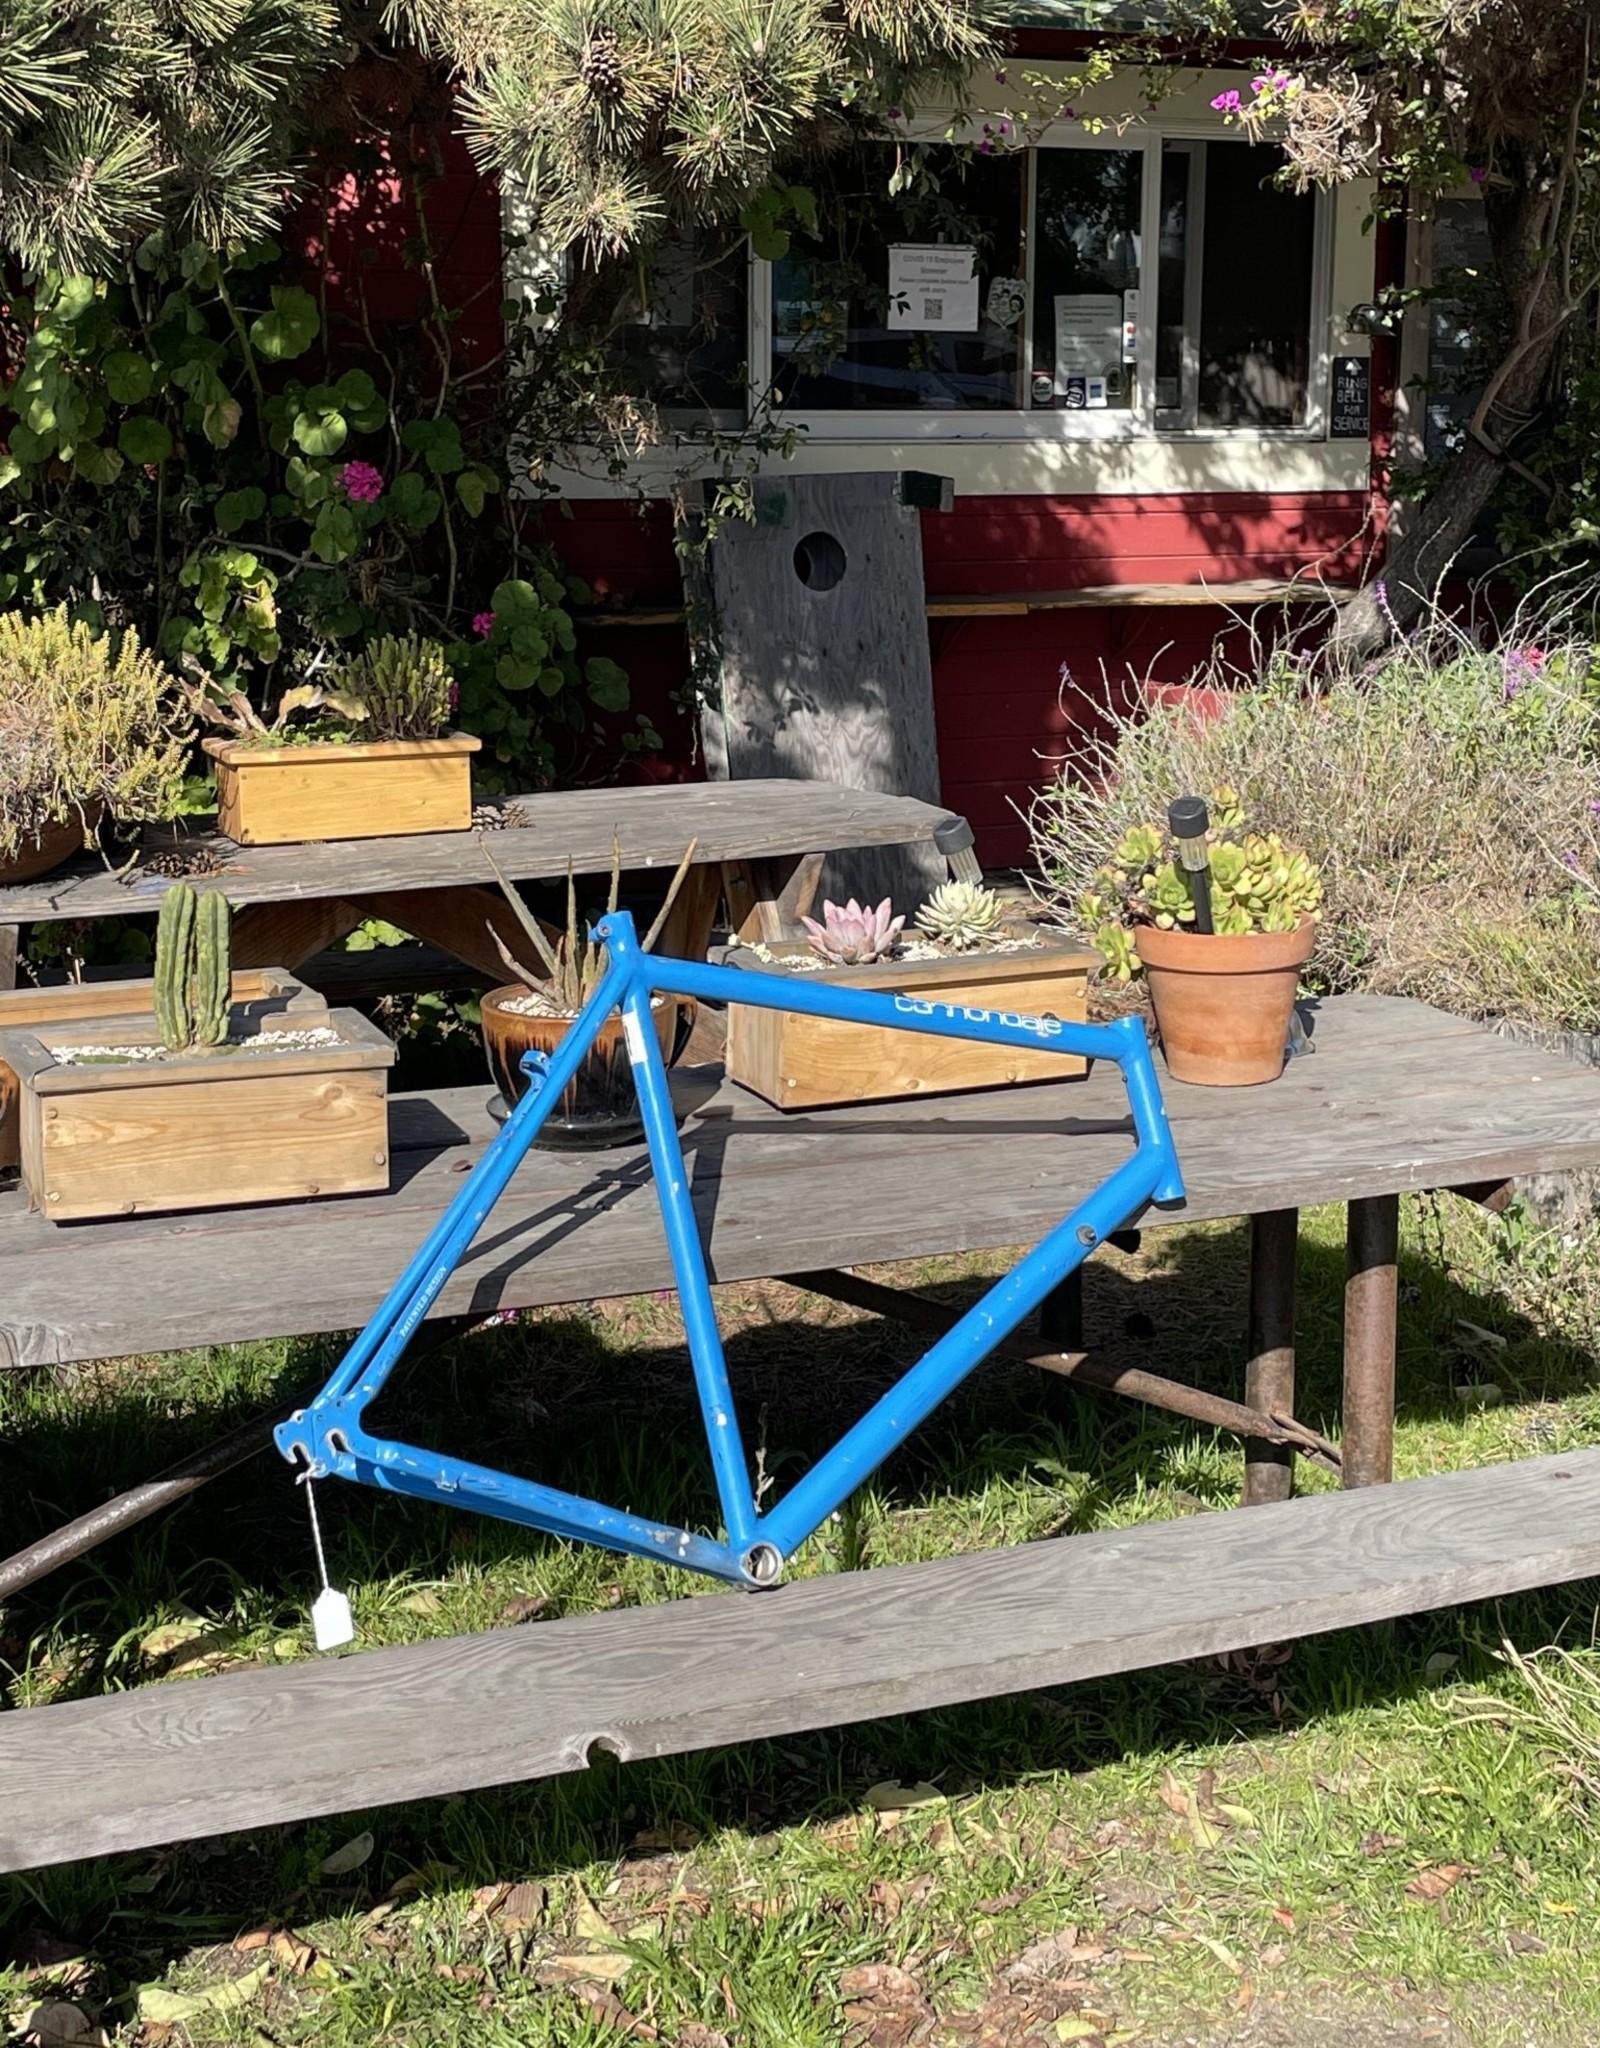 Cannondale Road Frame - 61cm